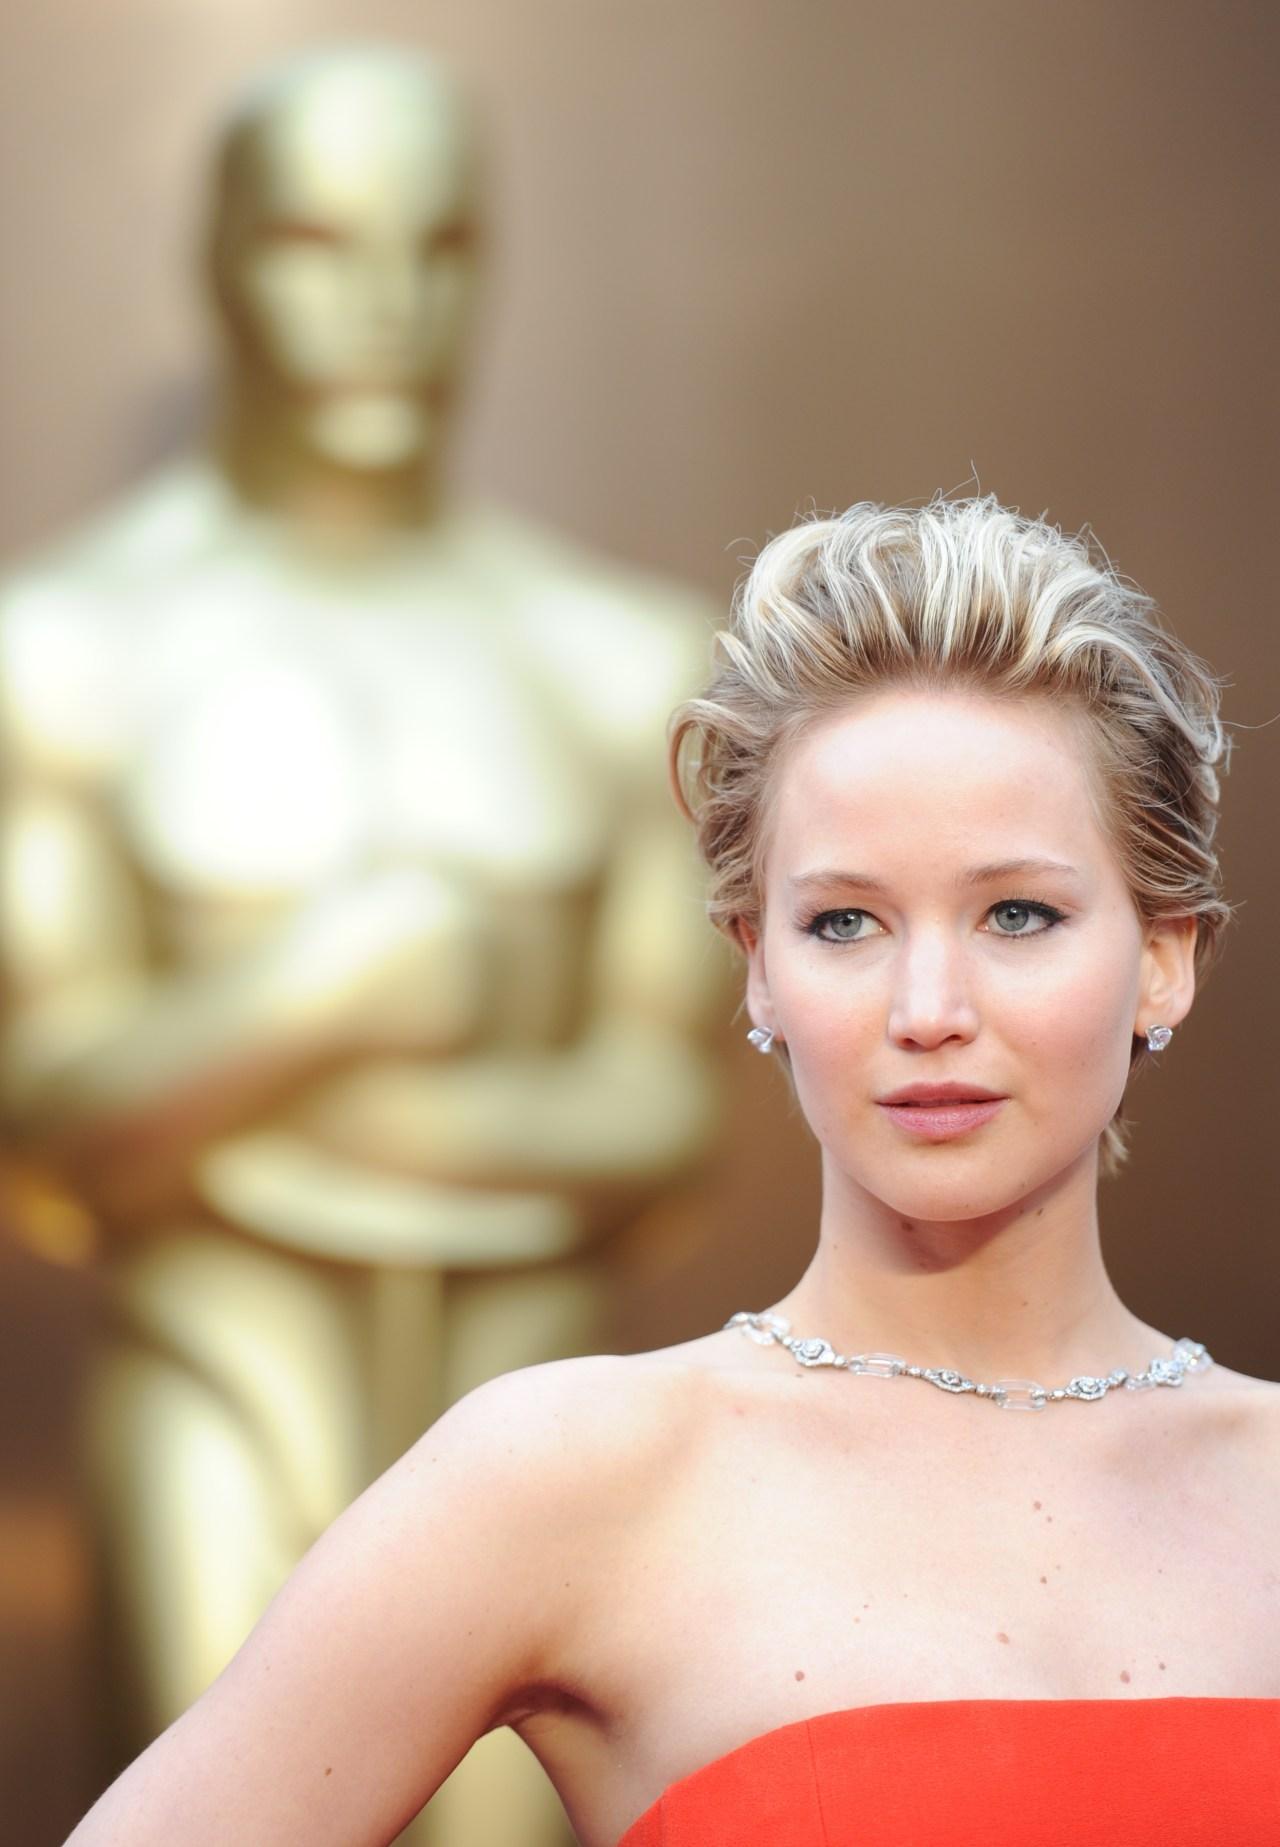 Hackers leak nude photos of Jennifer Lawrence, Victoria